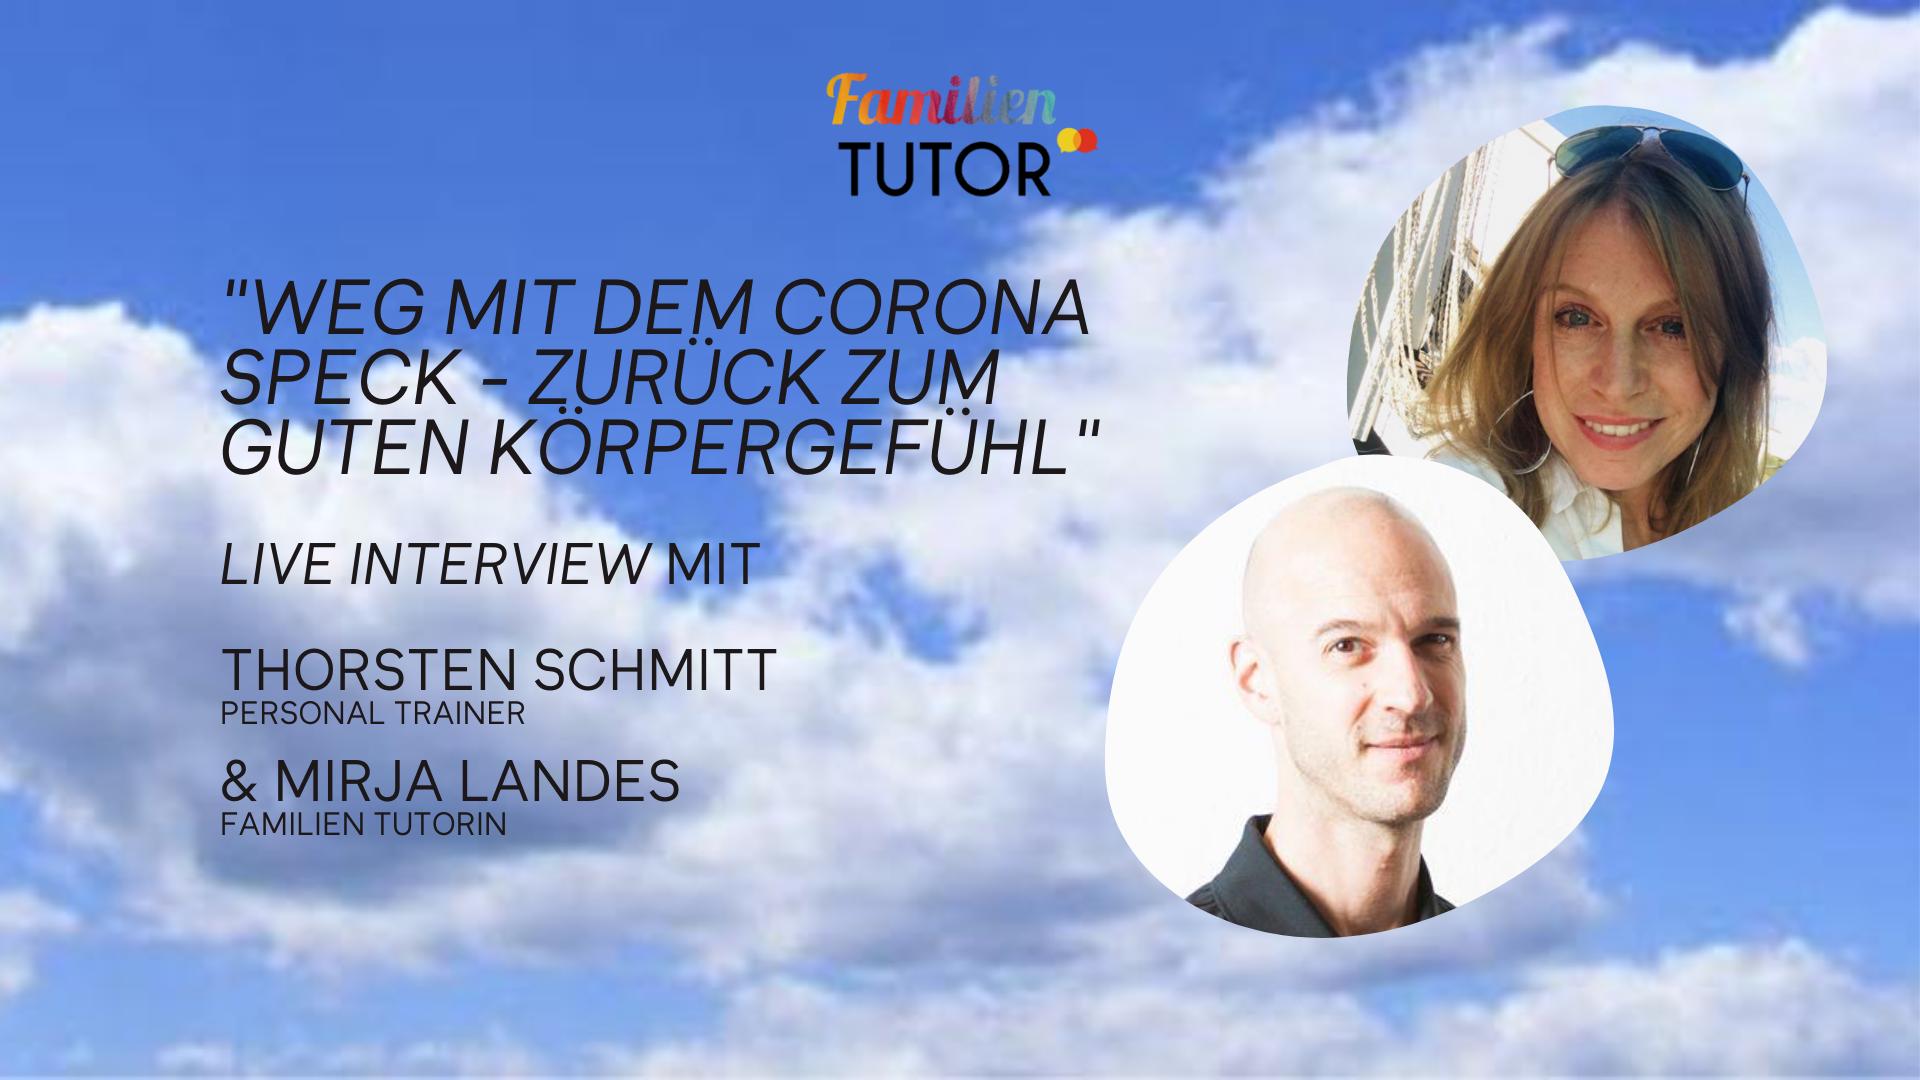 Family Friday Tutorial mit Thorsten Schmitt